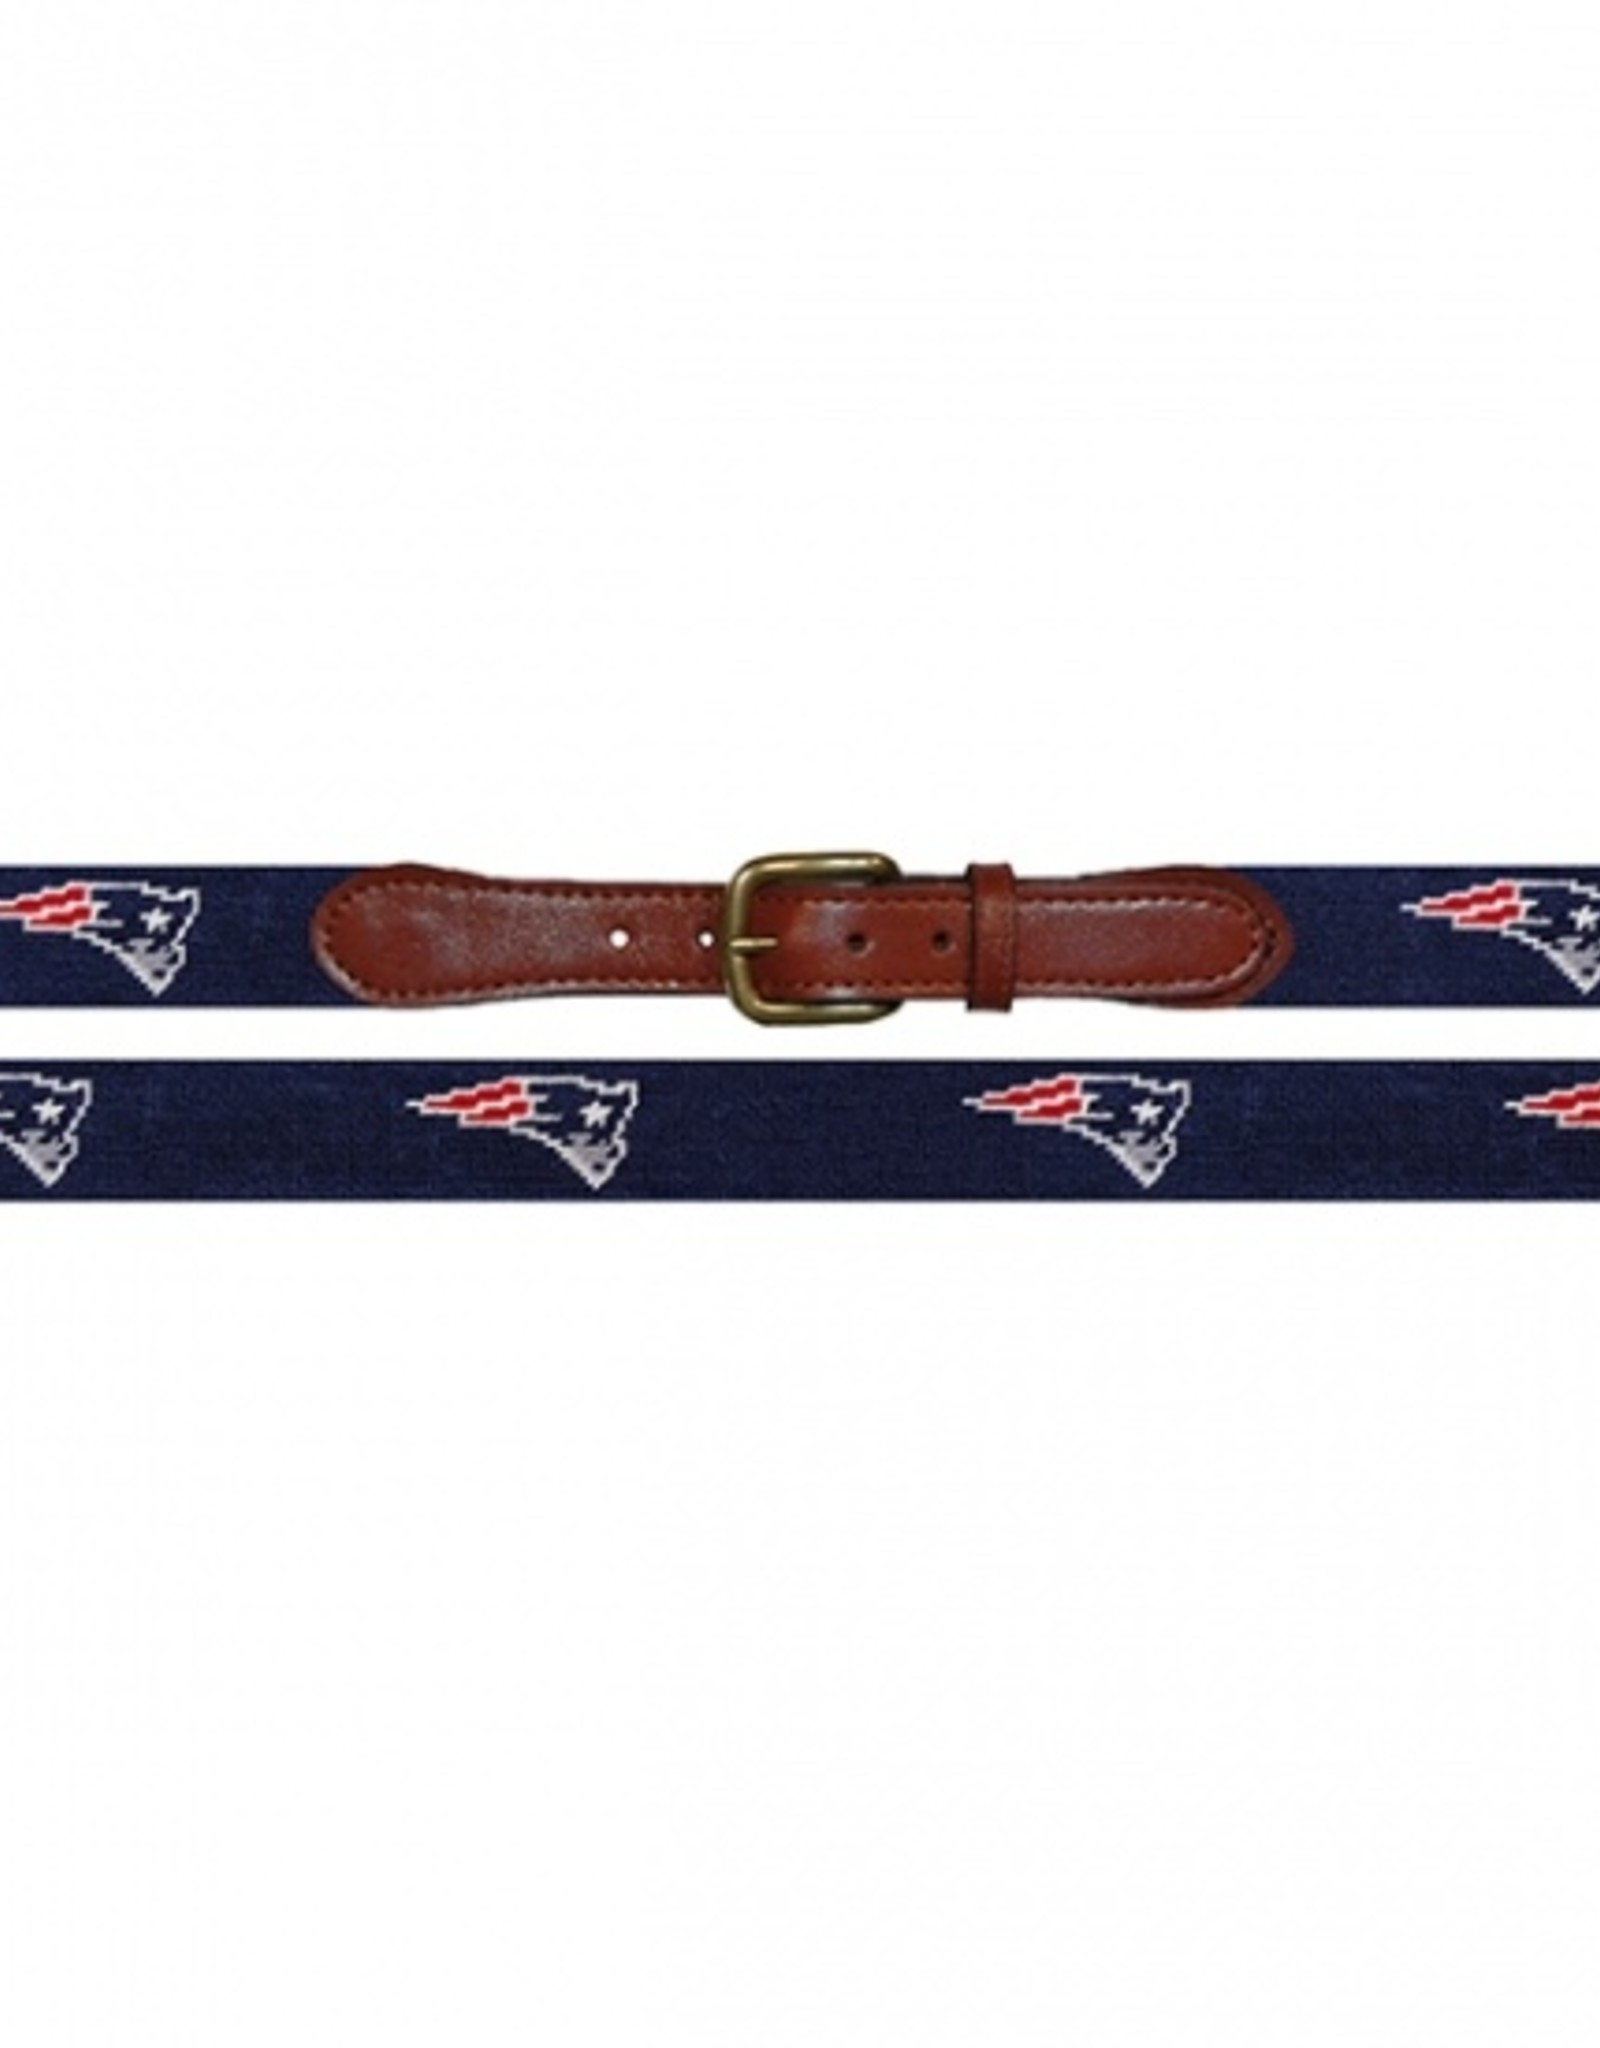 "Smathers and Branson  ""New England Patriots"" Needlepoint Belt"